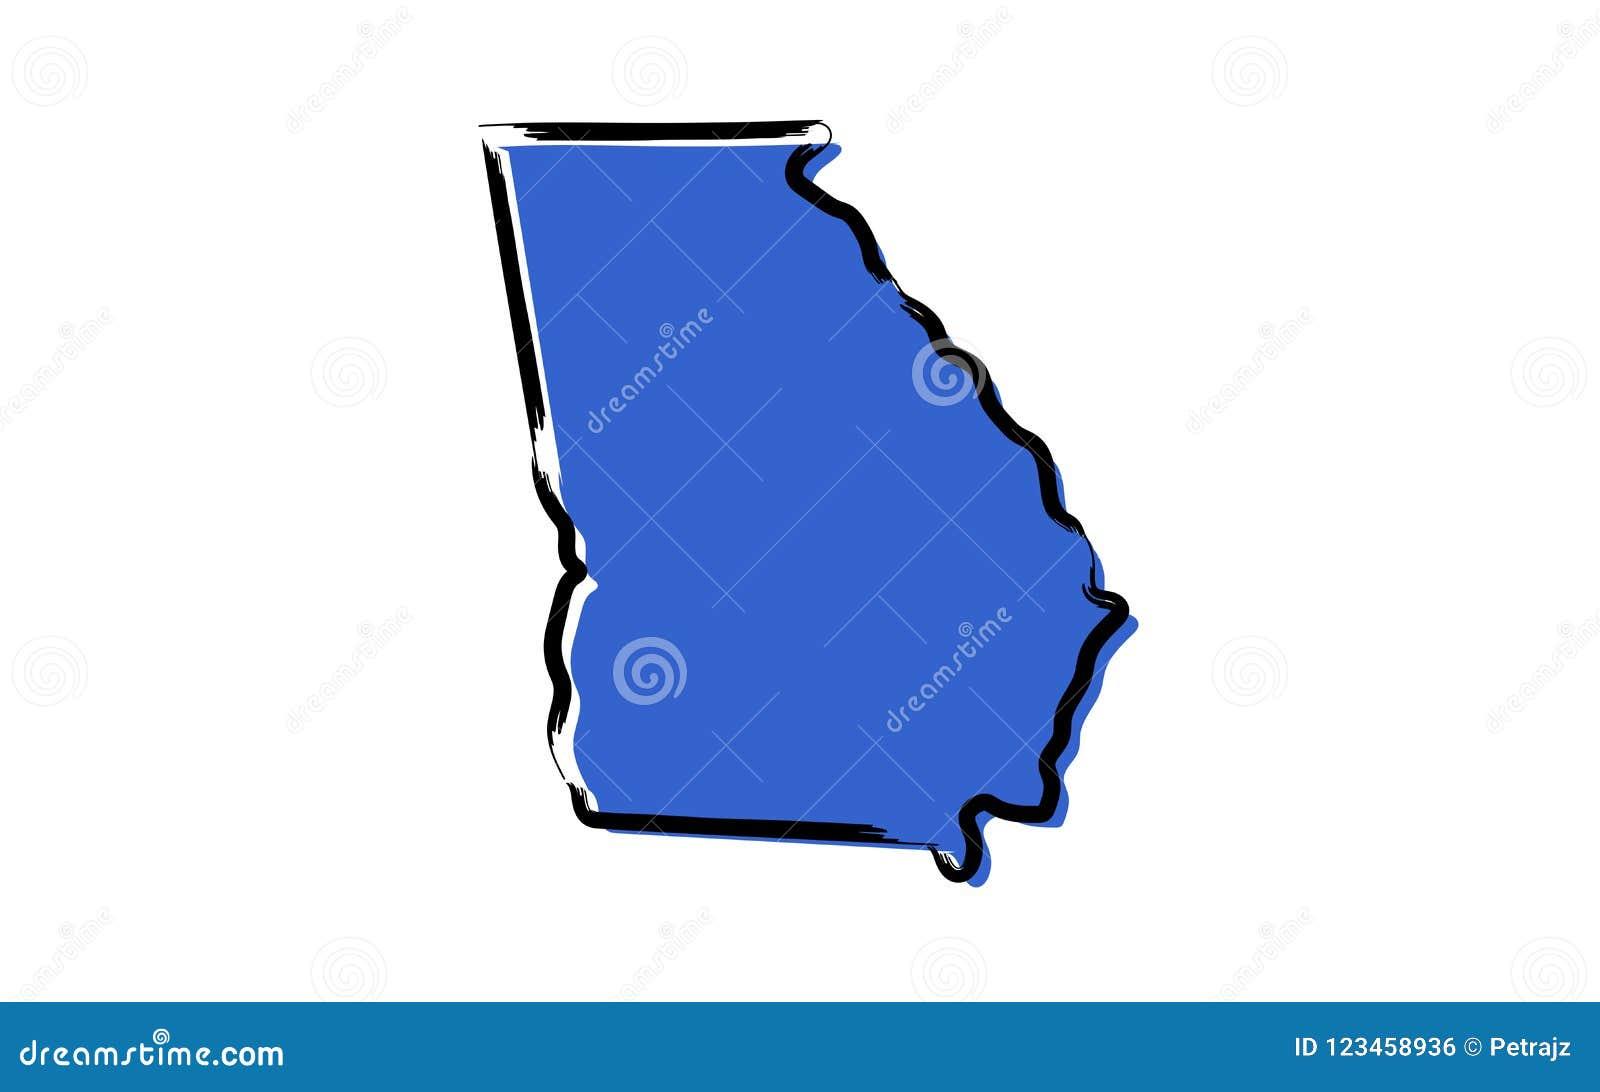 Stylized Blue Sketch Map Of Georgia, USA Stock Vector ... on georgia on map of asia, georgia on us map, georgia on europe map,